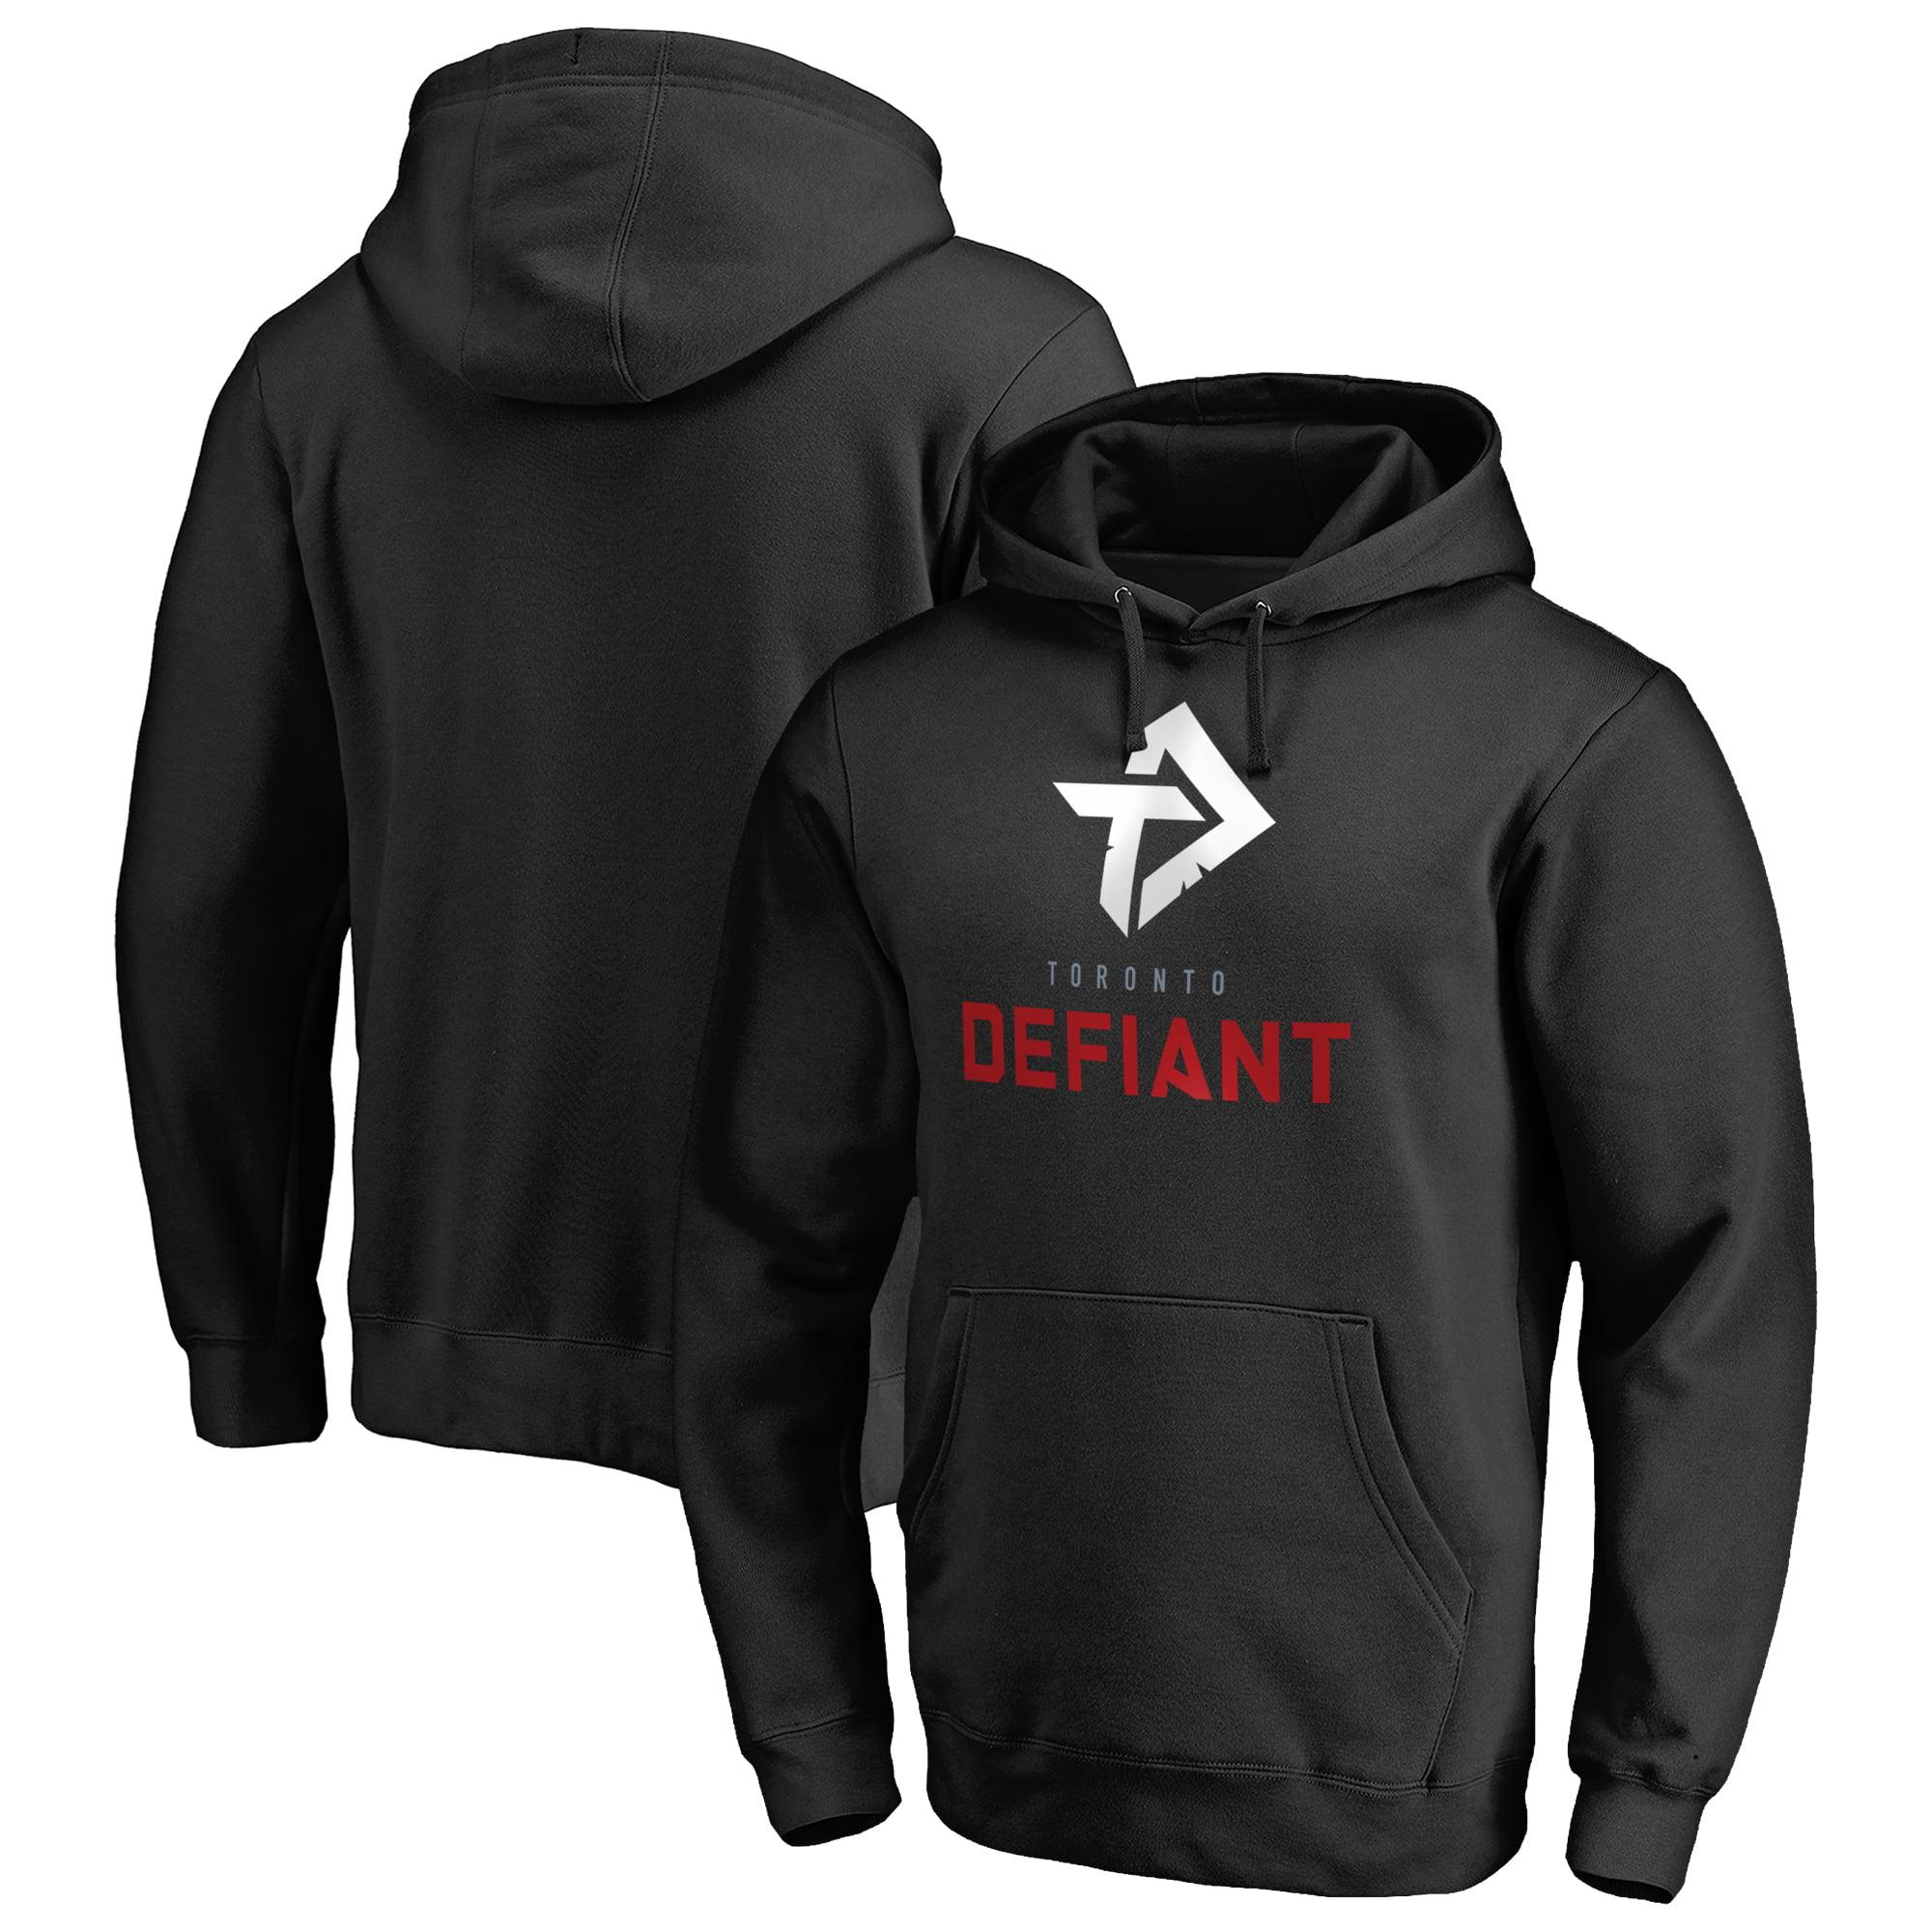 Toronto Defiant Fanatics Branded Team Identity Pullover Hoodie - Black